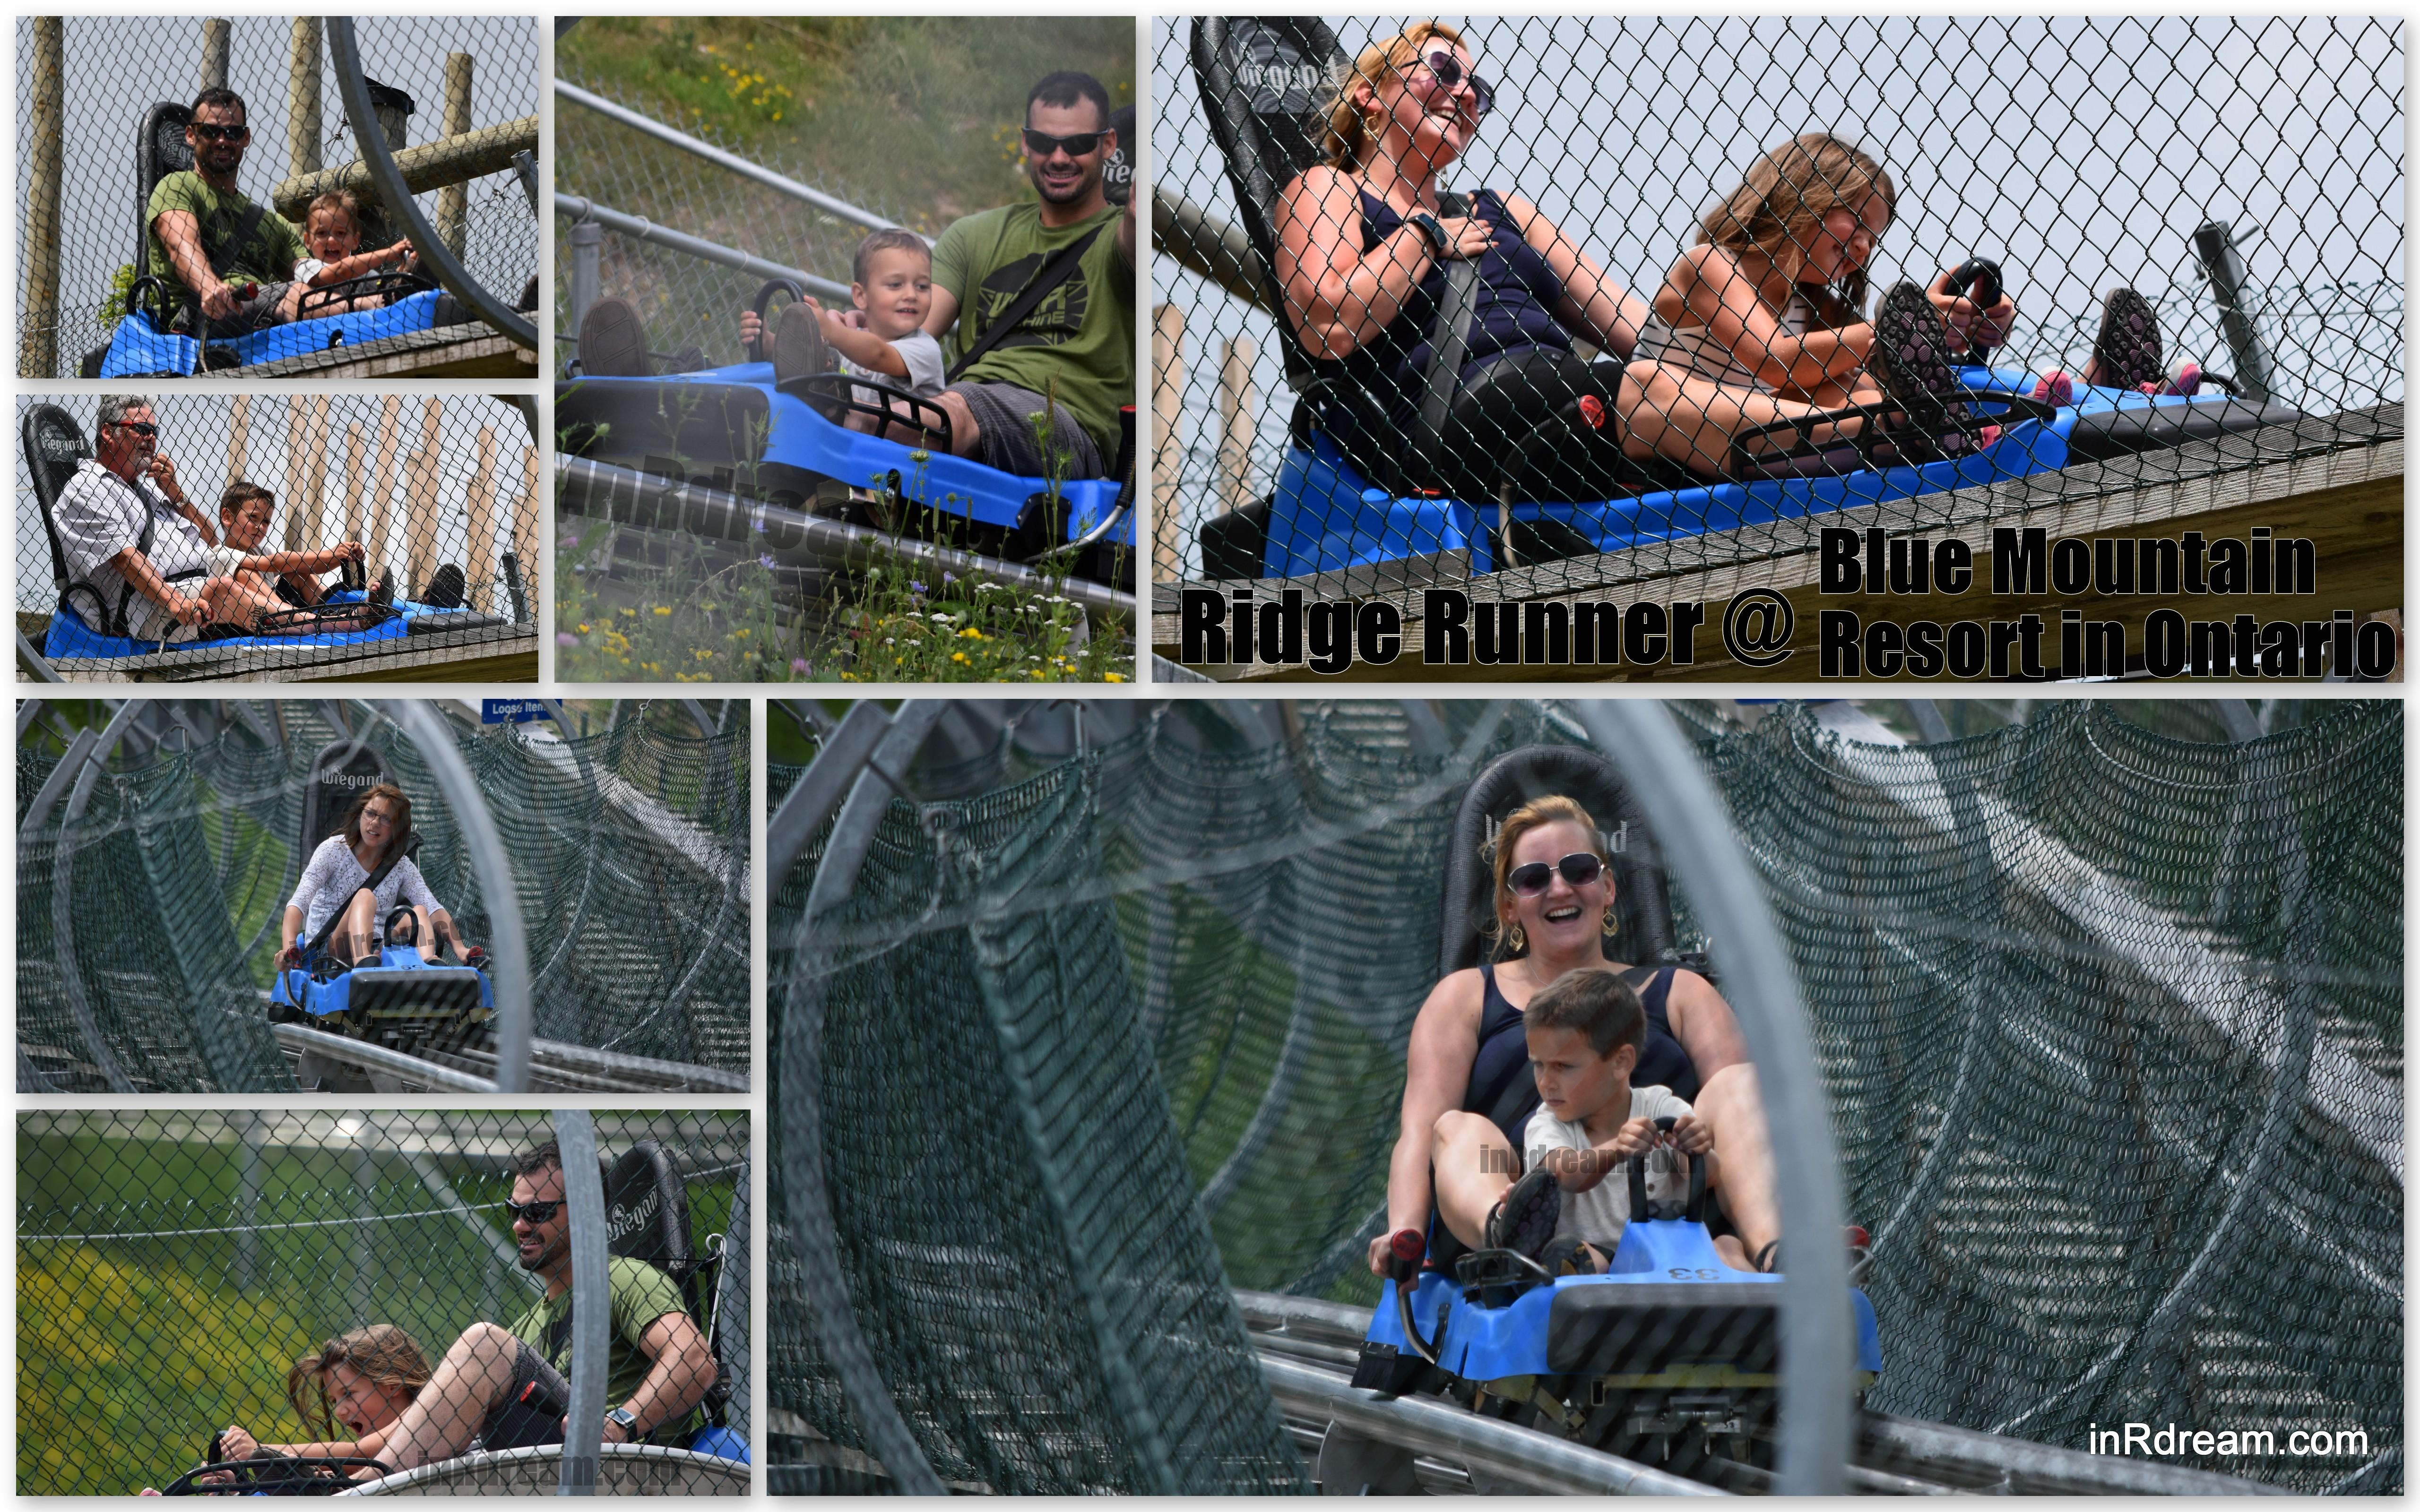 Family Summer Adventure: Blue Mountain Resort Ontario #BiggerBlue